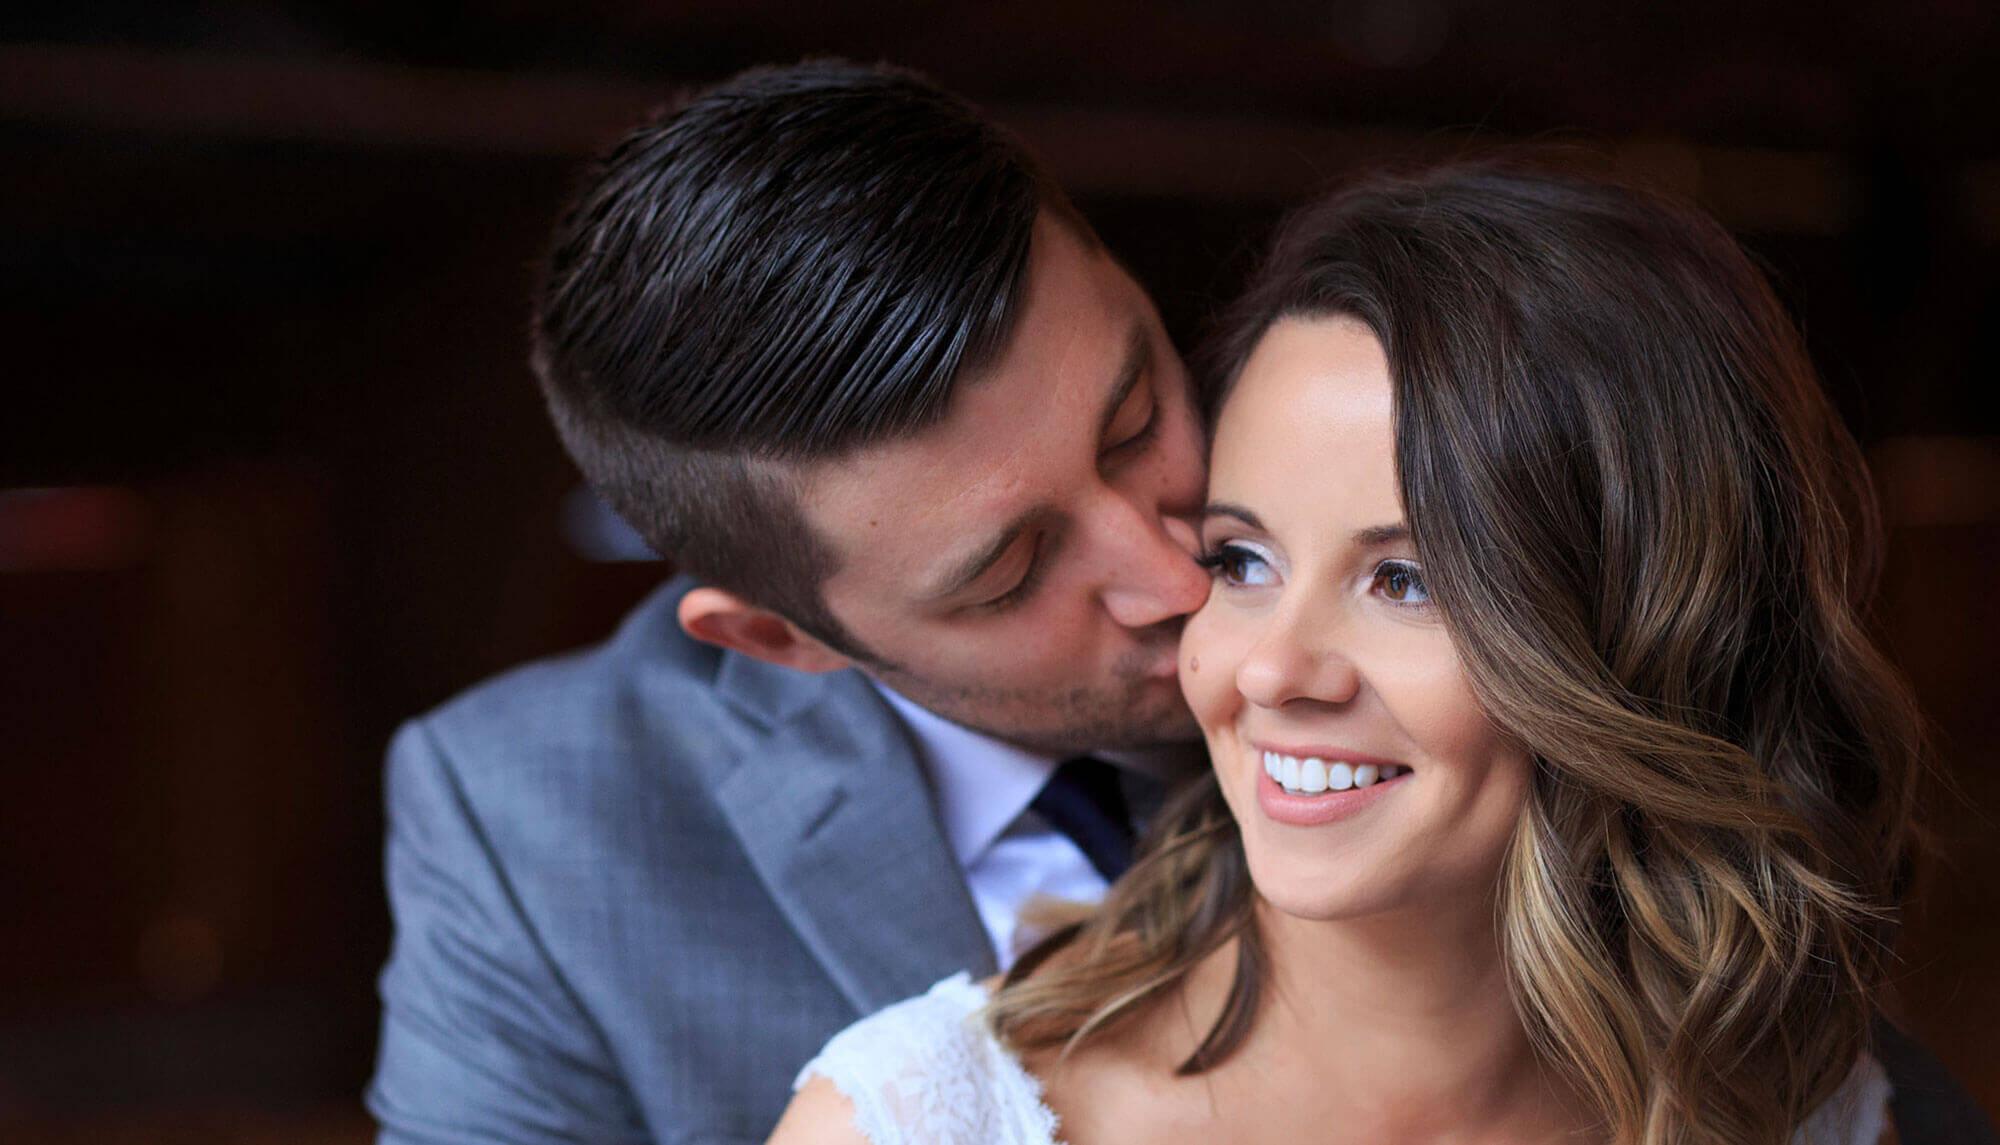 Bride groom intimate moment northwest arkansas wedding photographer striegler photo